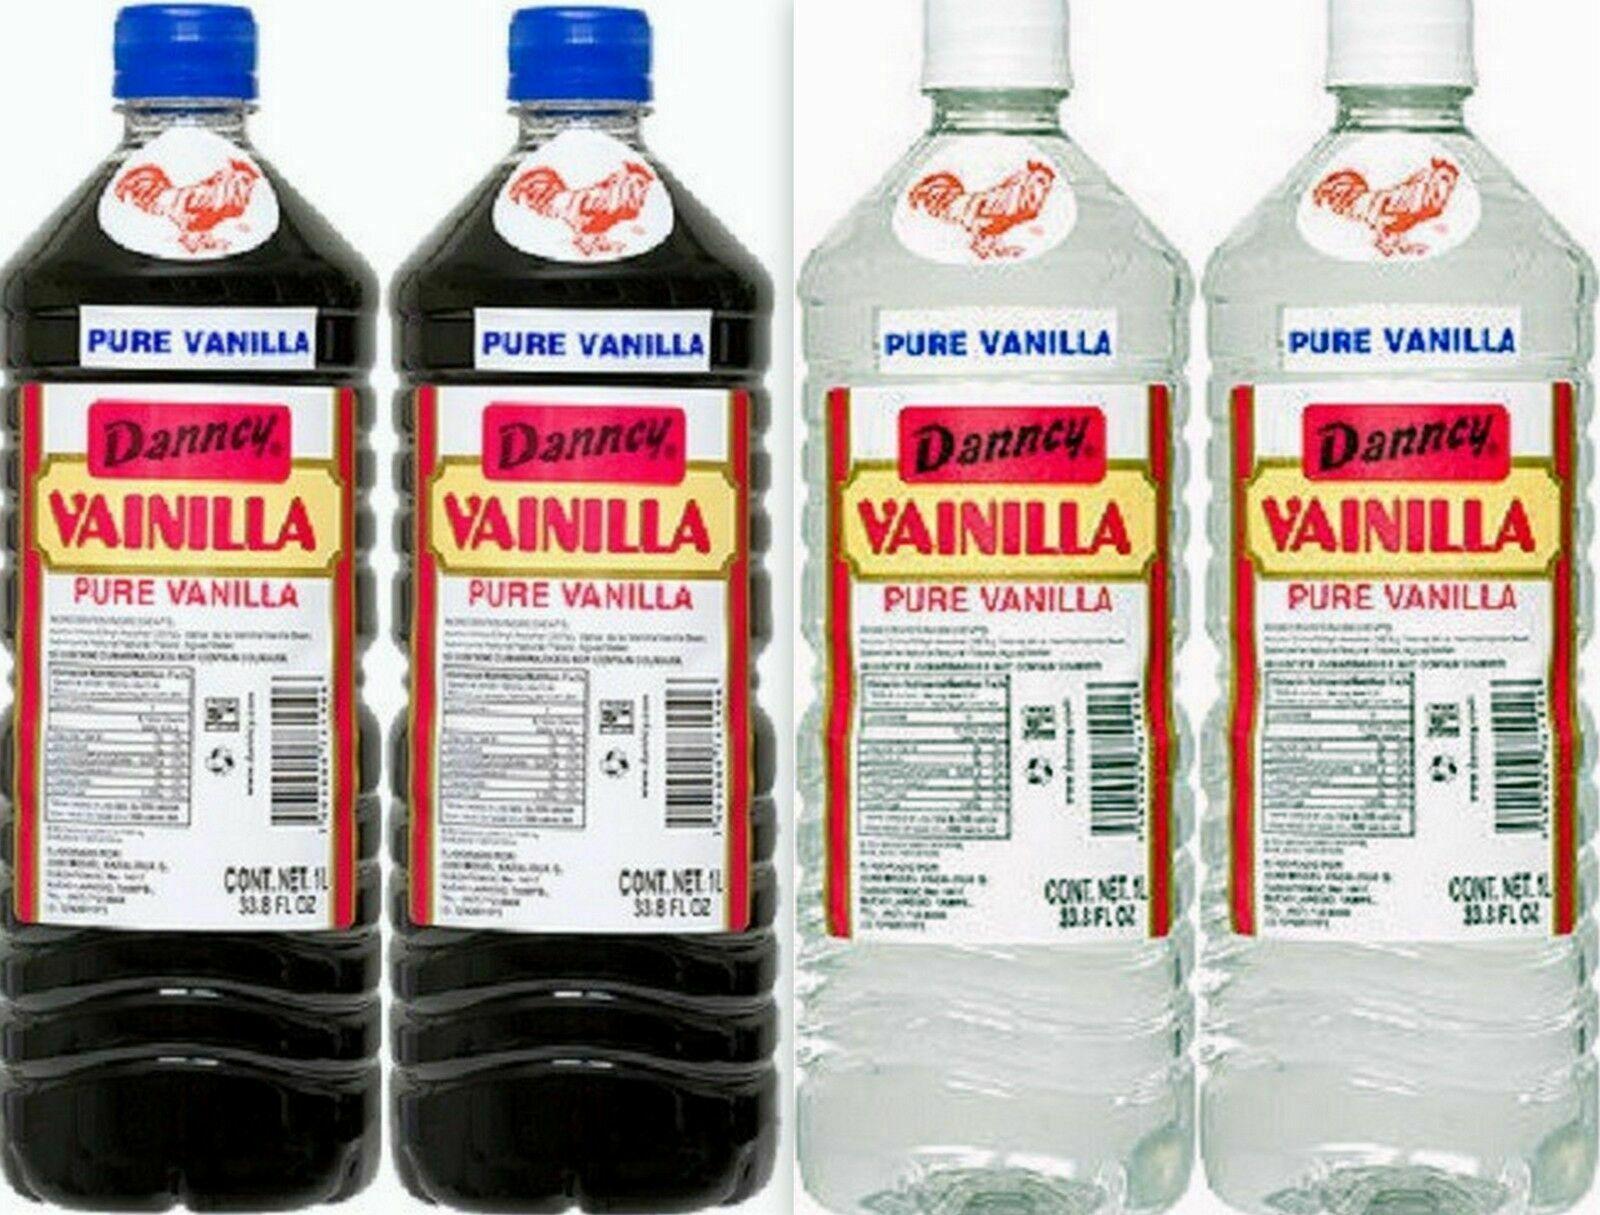 4 X Mixed Danncy Pure Mexican Vanilla Extract 33oz Ea Plastic Bottles Mexico - $35.00